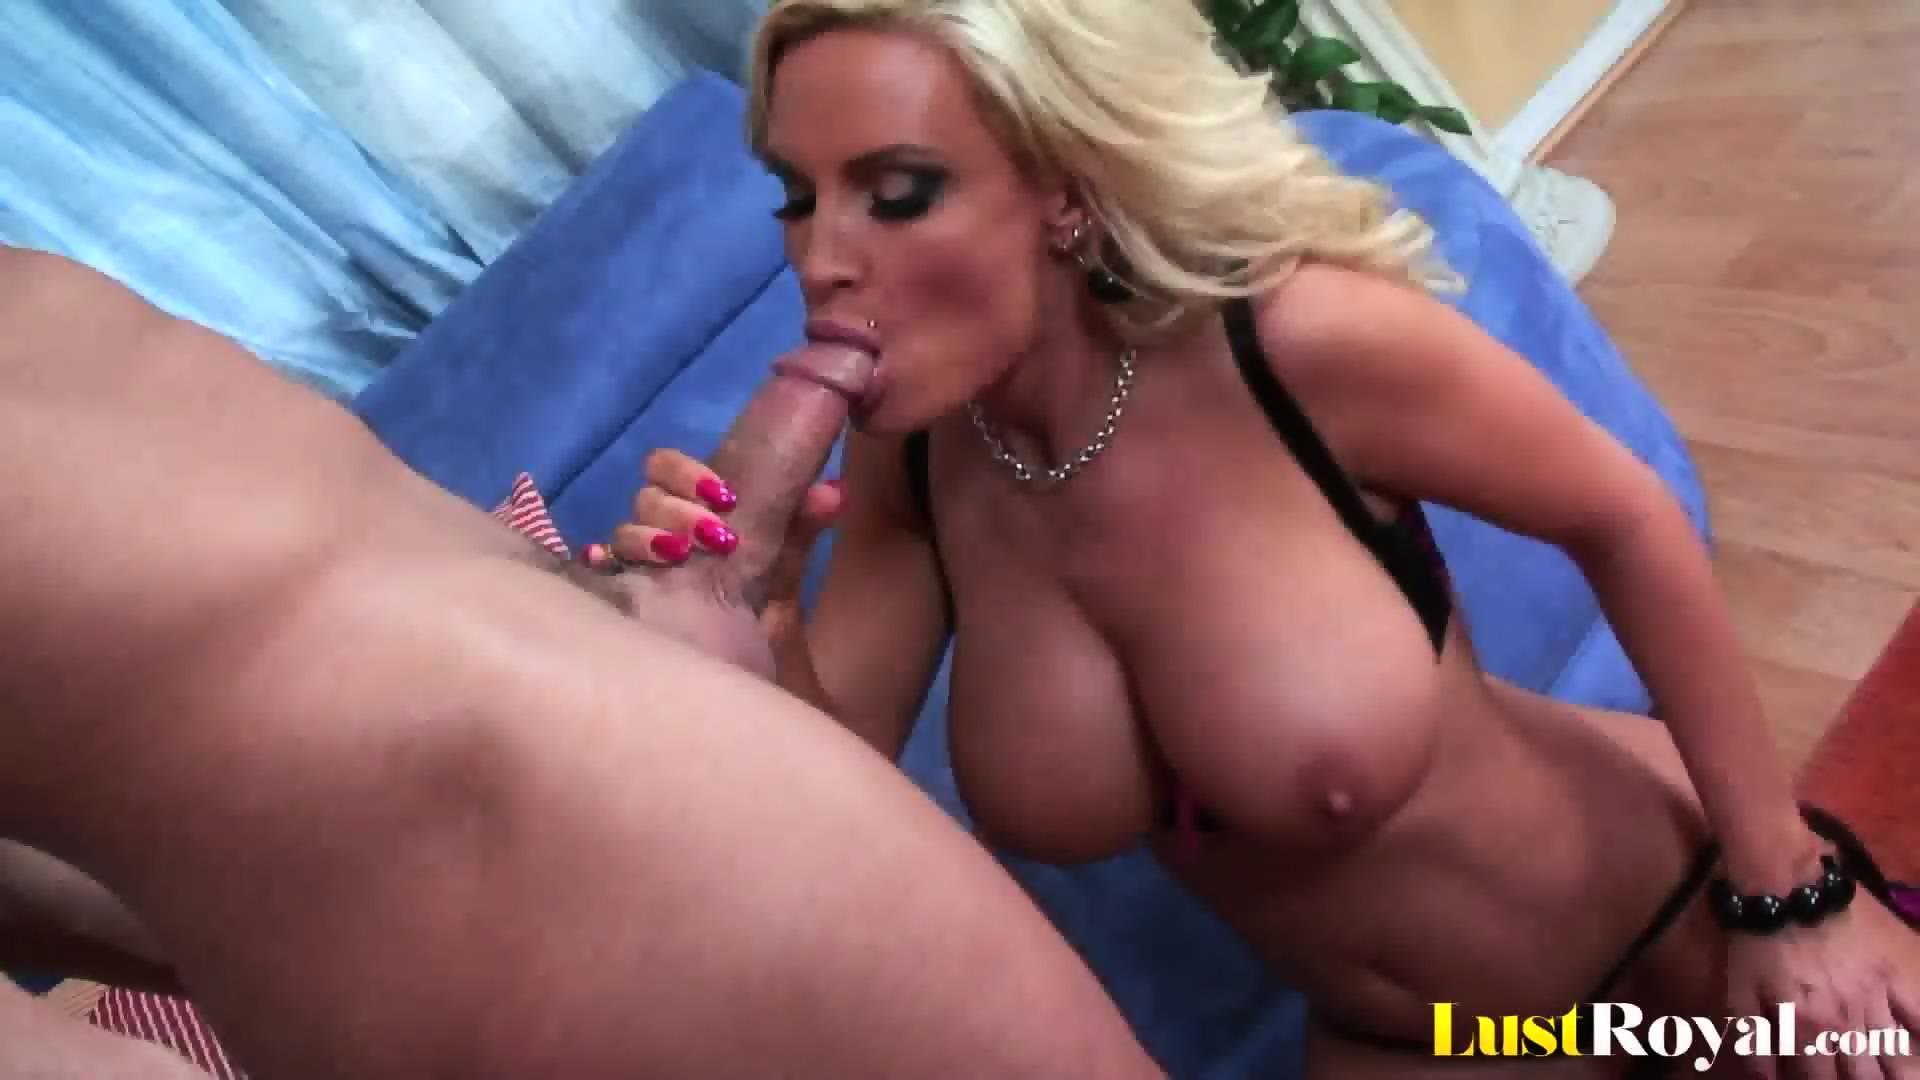 Nude mom mature porn tube milf pussy videos XXX